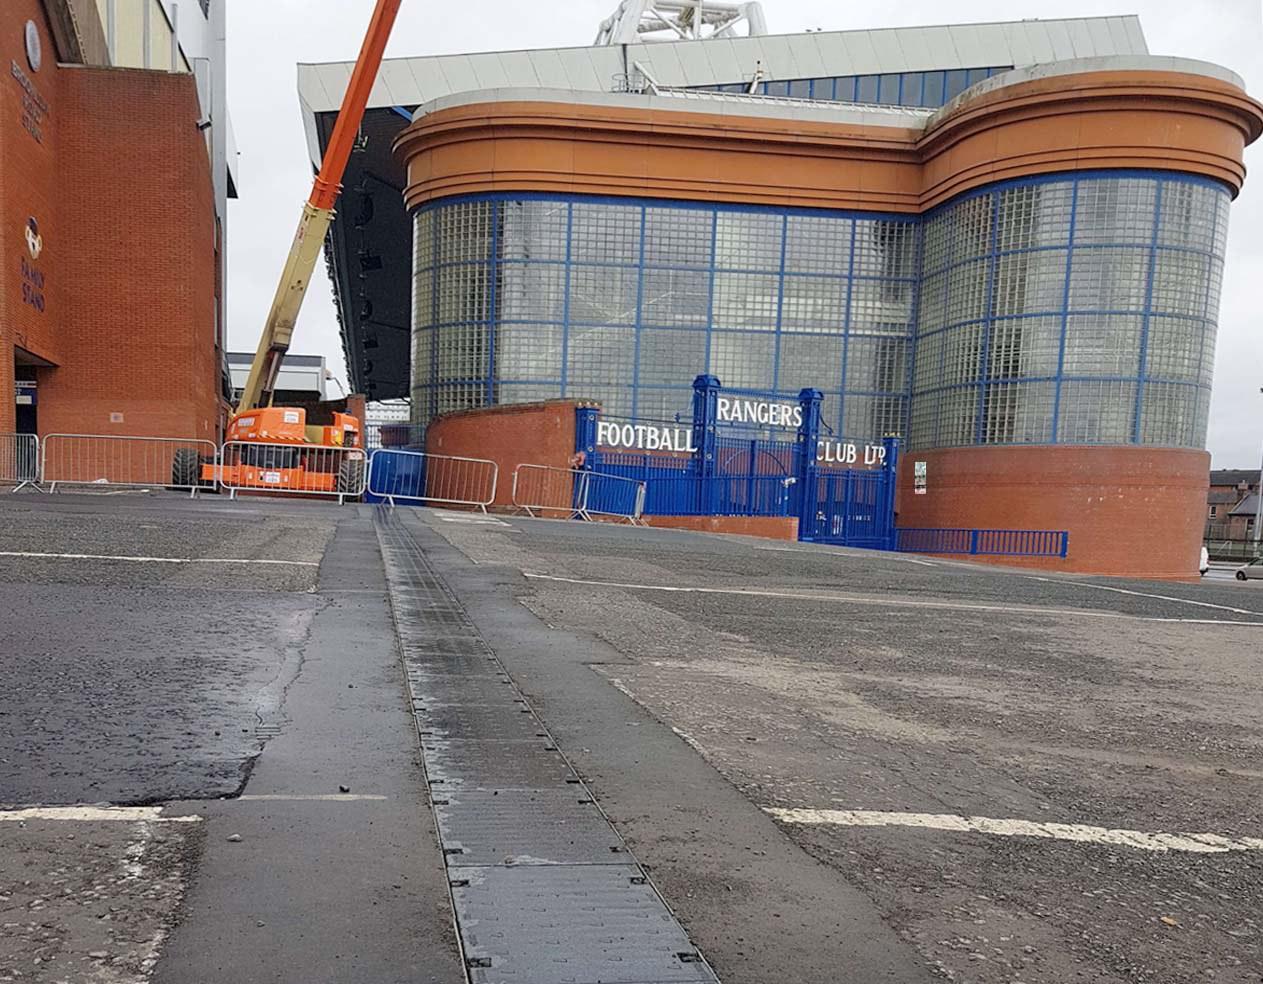 ULMA drainage channels in Ibrox Football Stadium, Glasgow, Scotland